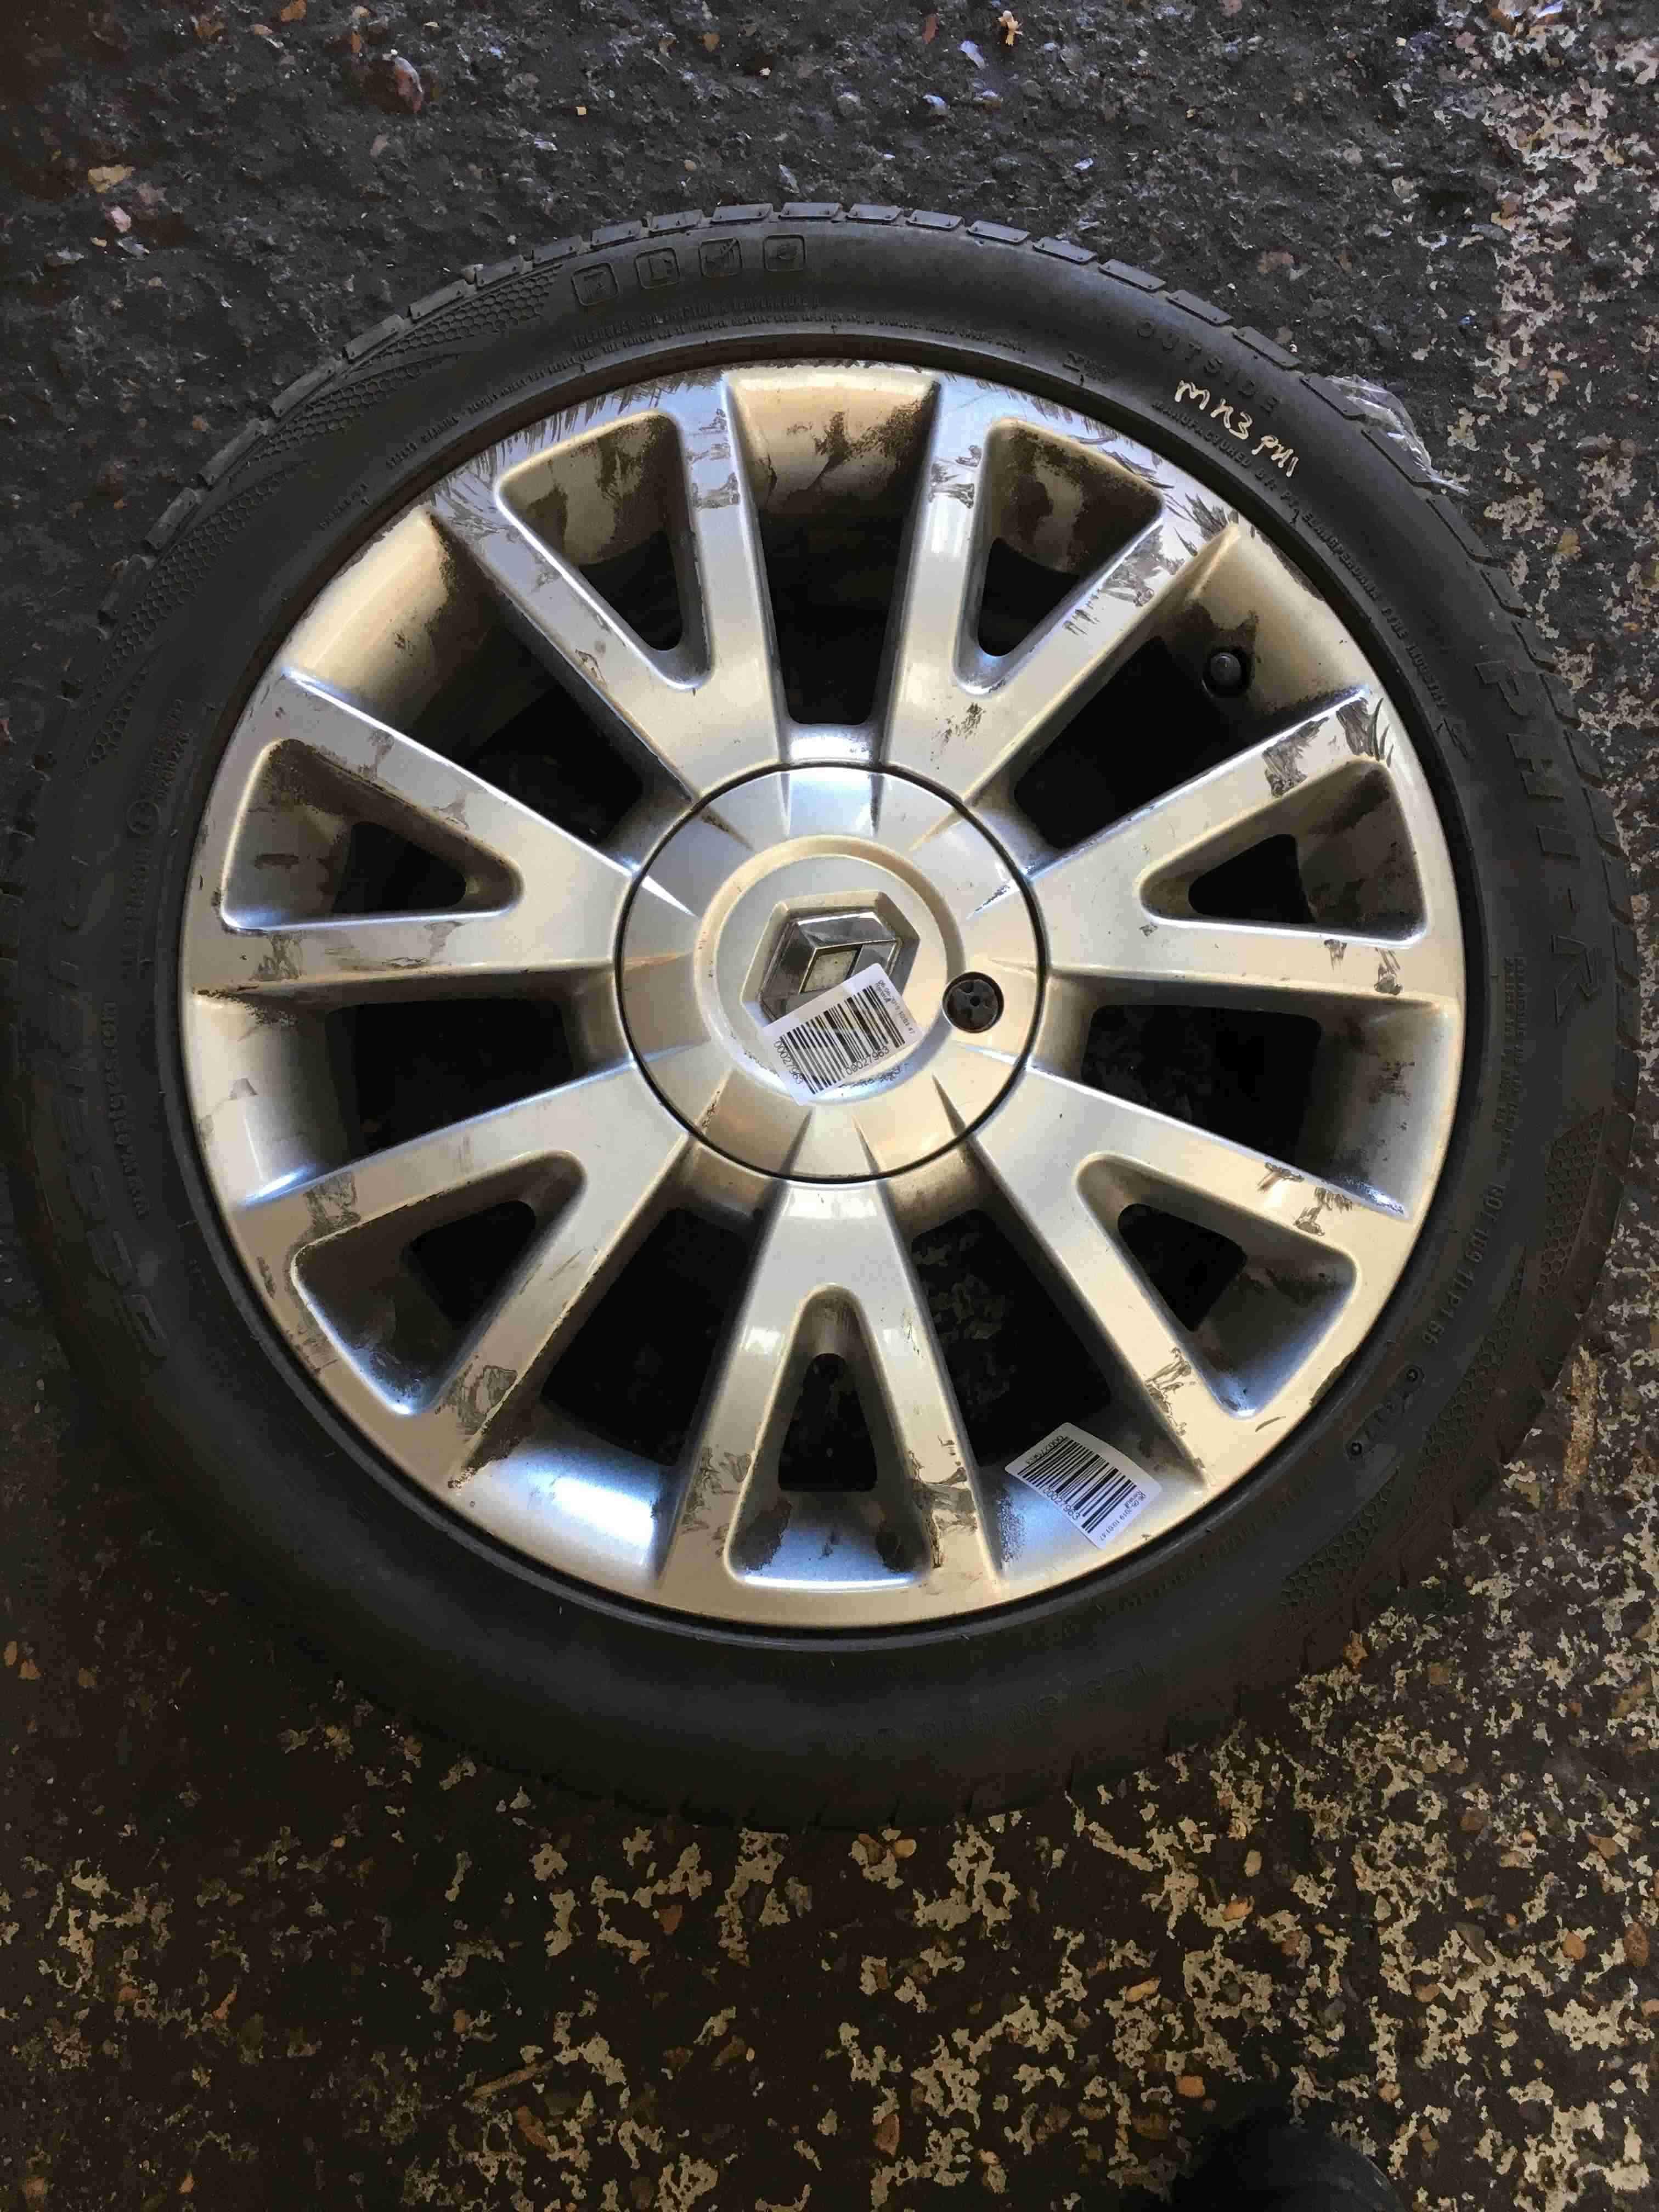 Renault Clio MK3 2005-2012 Canasta Alloy Wheel 16inch + Tyre 195 50 16 6mm